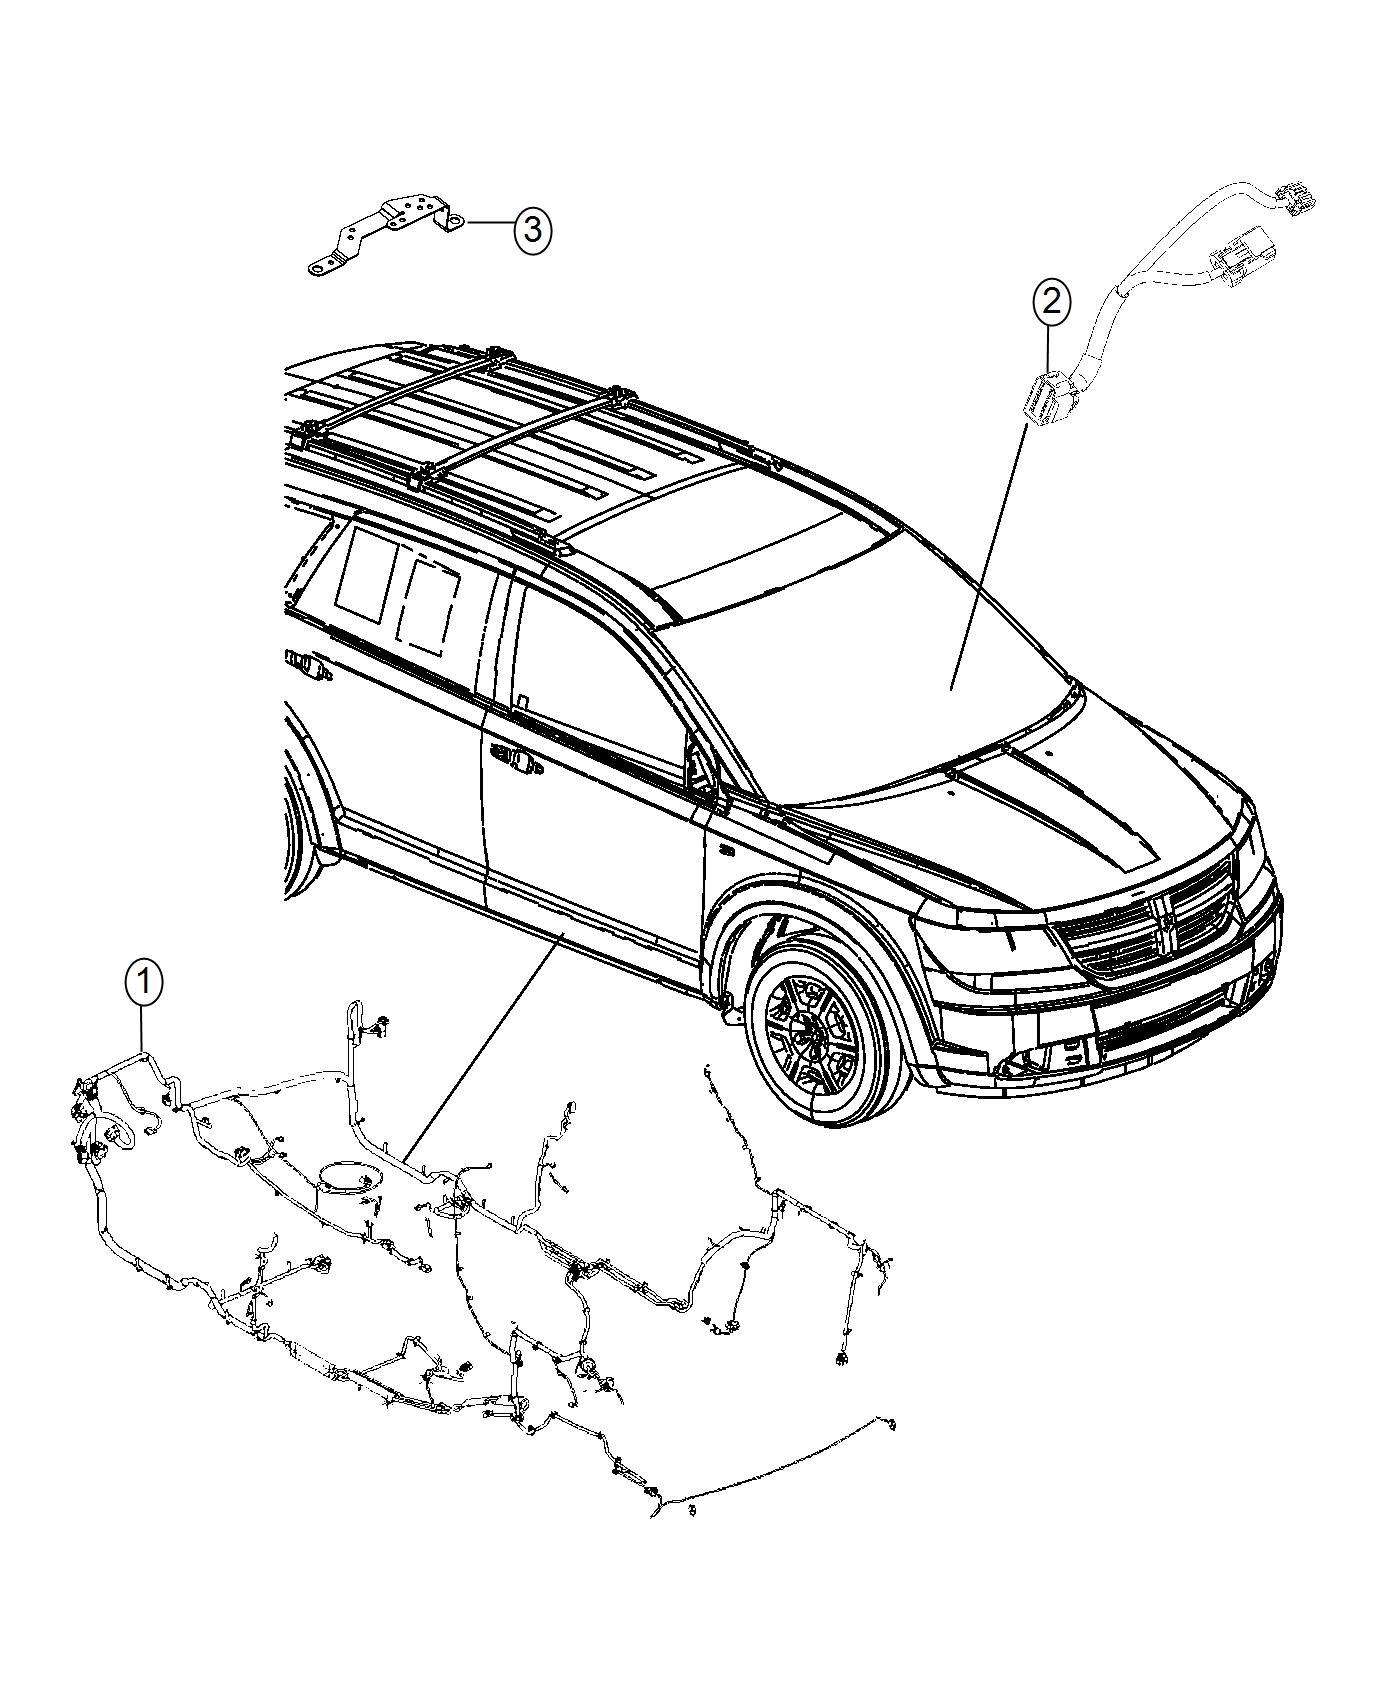 2016 Dodge Journey Wiring. Unified body. Us, canada. Rear